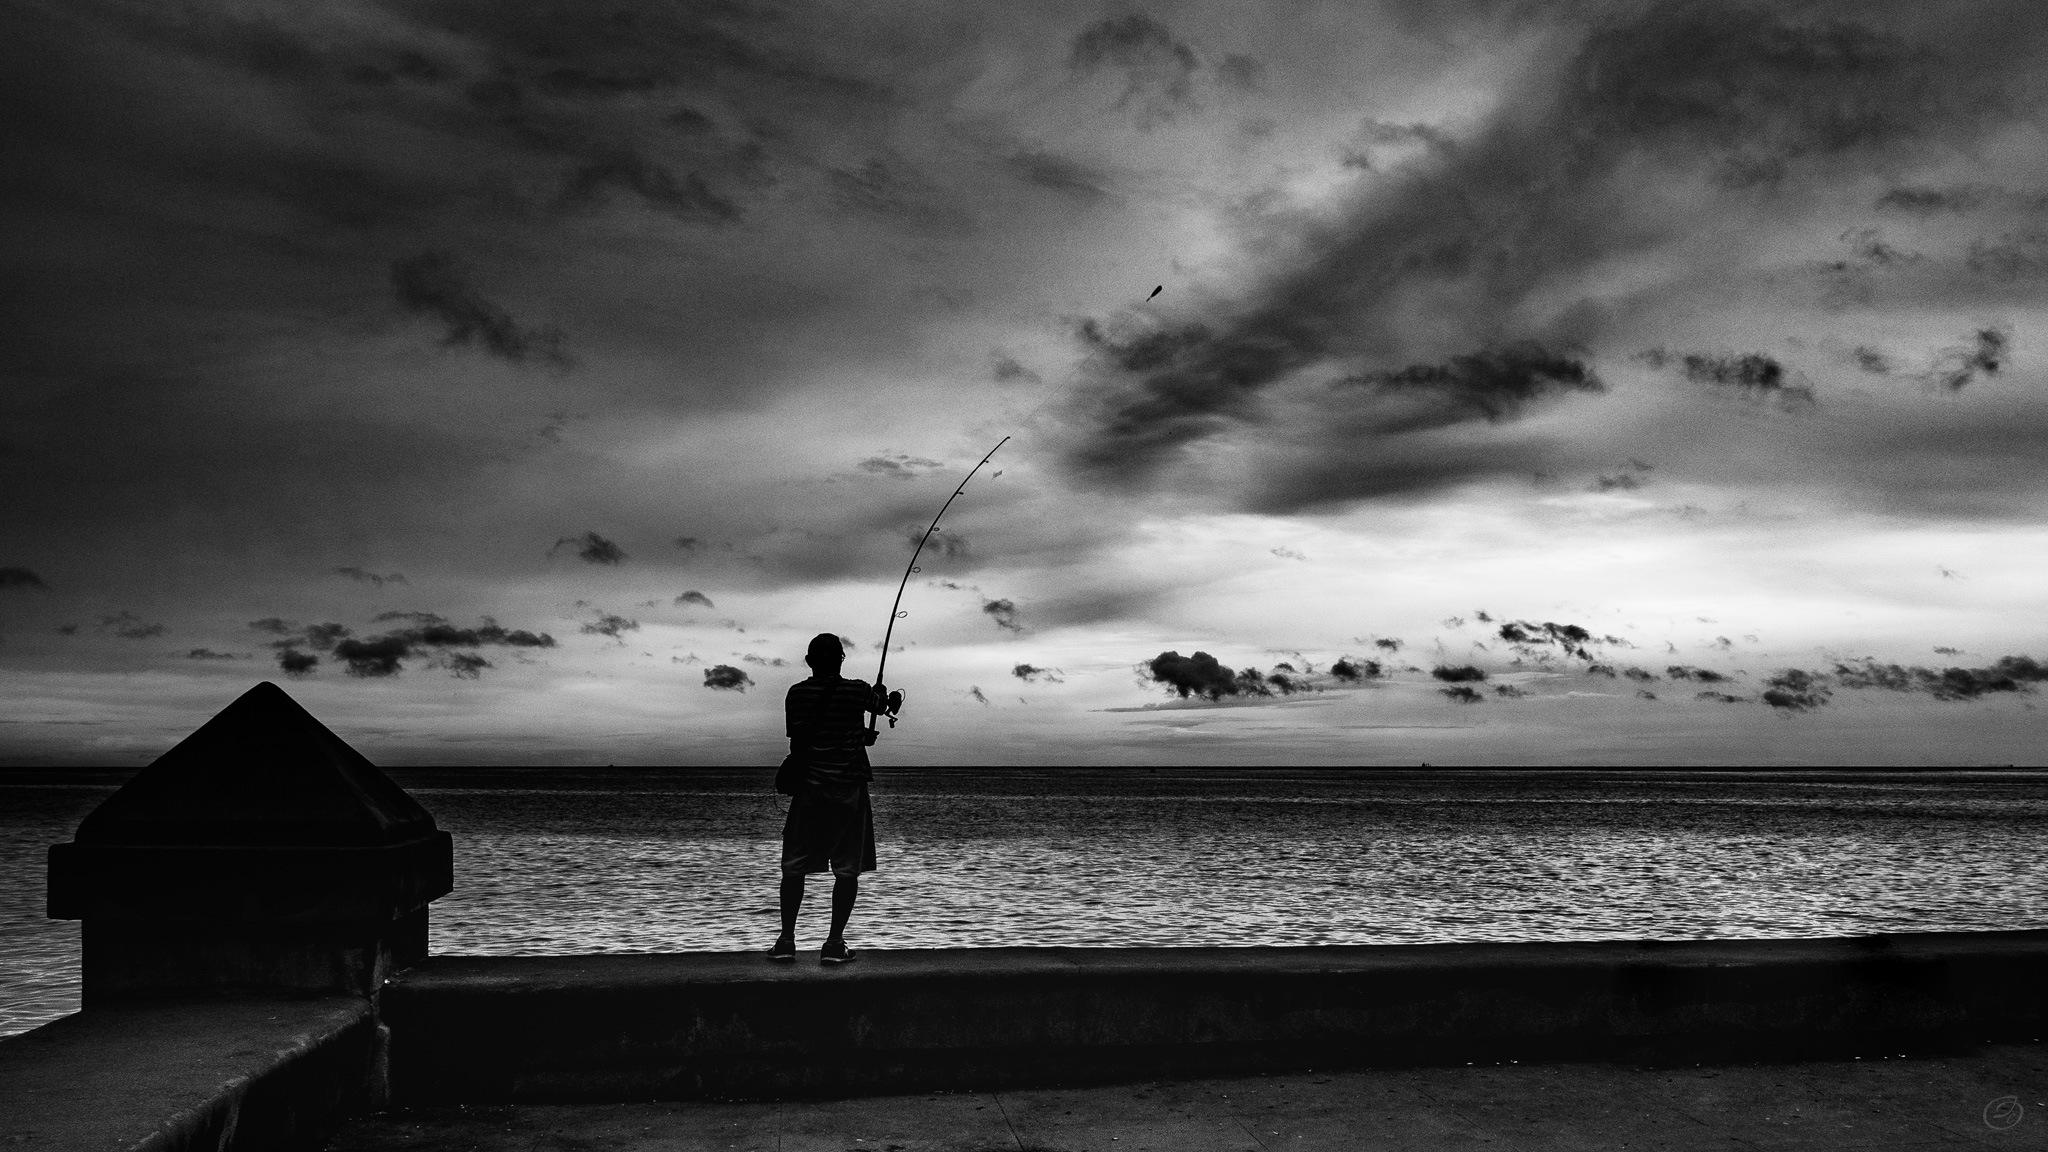 Malicon - Cuba  by TJ Deh (der jOe )